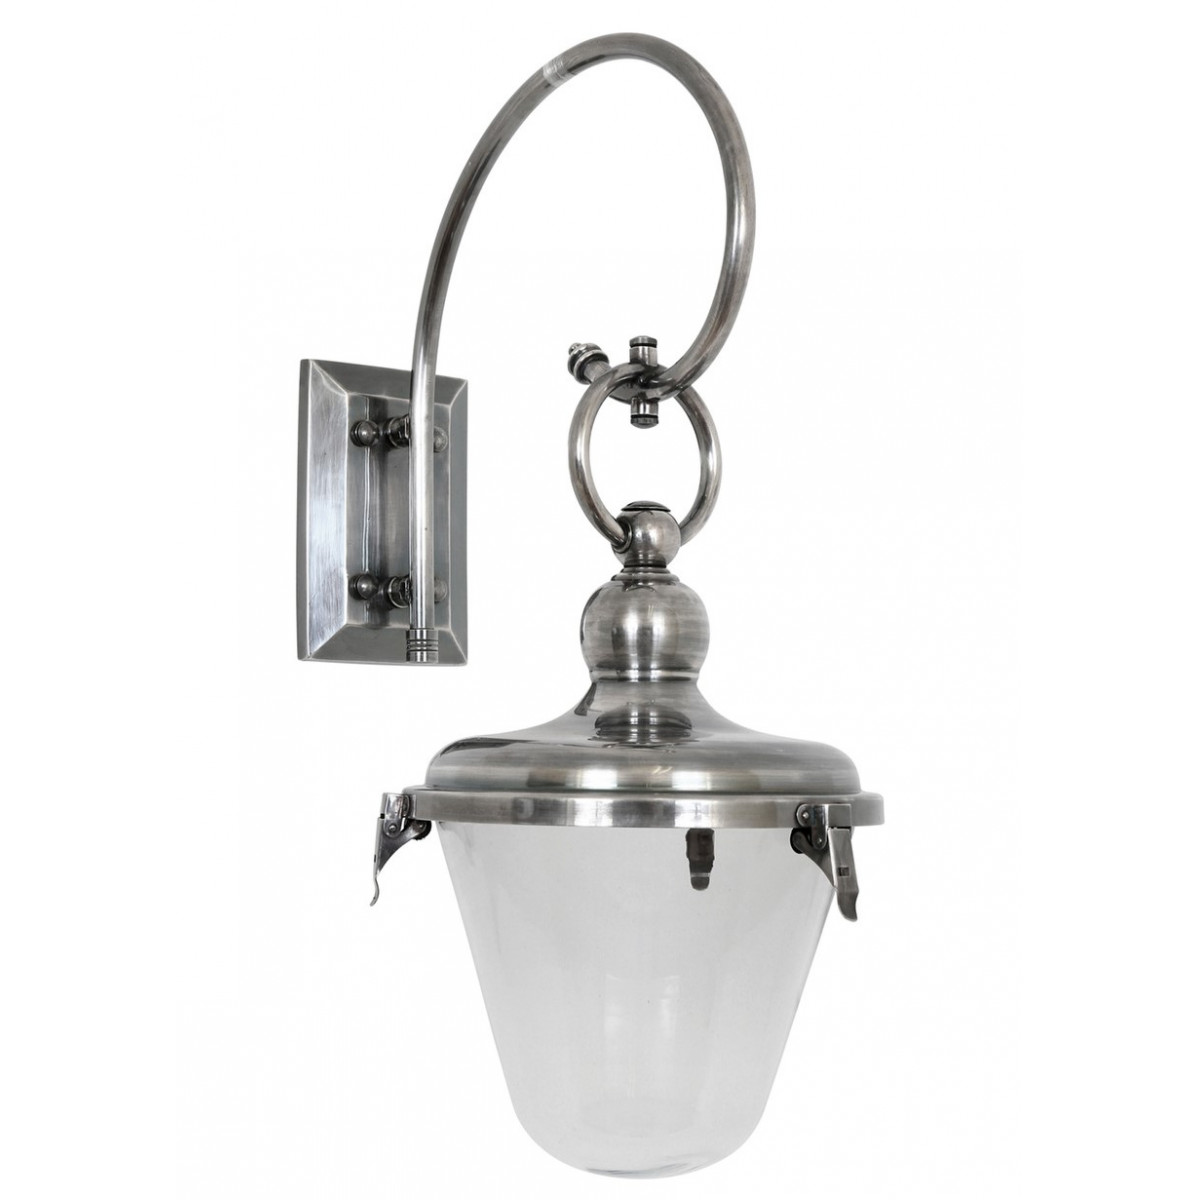 Wandlamp Antiek Belleclaire wandlamp - muurlamp - lampen